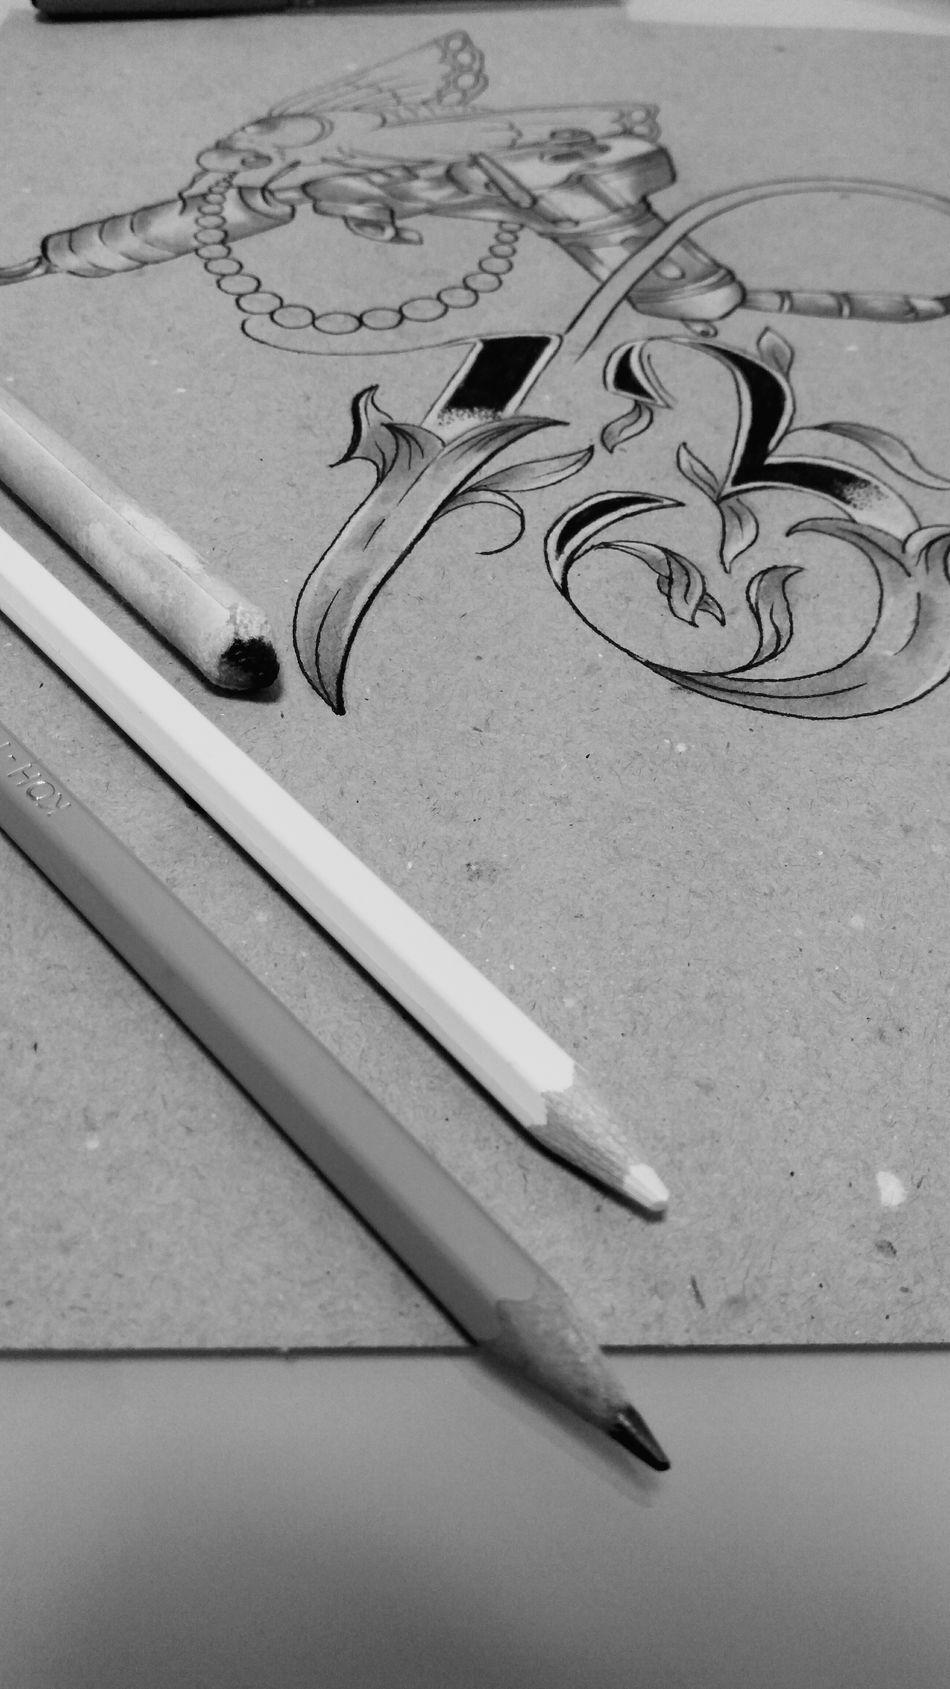 My sketch my work FB pages : Deer Tattoo Studio Sketch Sketches Sketching Draw Drawing Art Artist Blackandwhite Progress 13 Tattoo Tattoos Slovakia Deertattoostudio